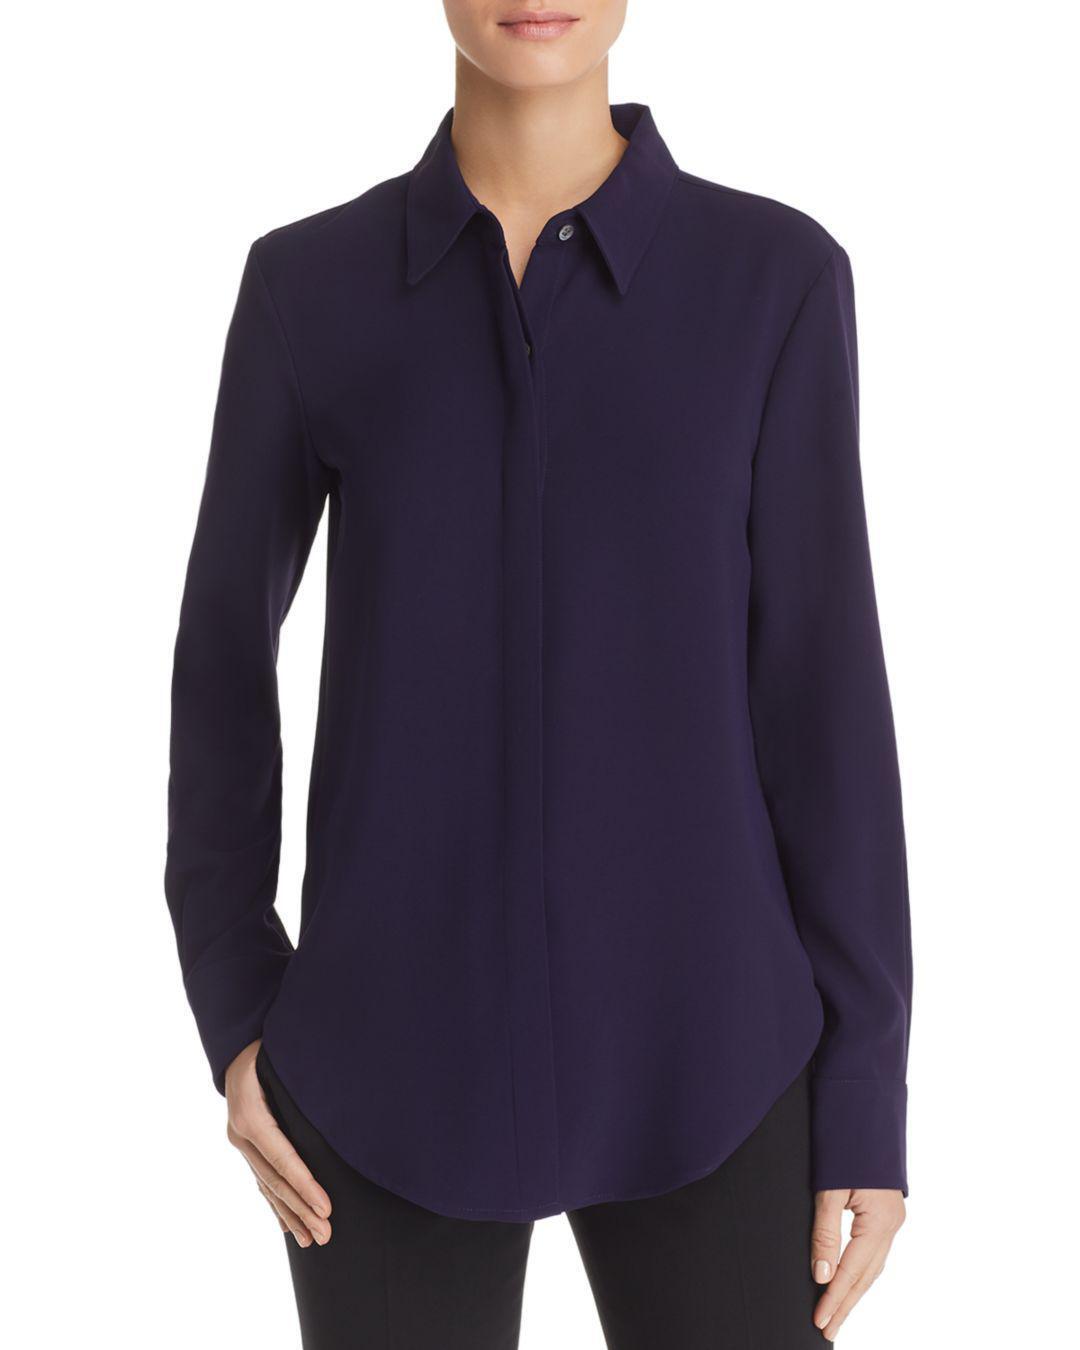 NWT Theory Sunaya Crepe Shirt Blouse Storm Navy Größe P(XS), S